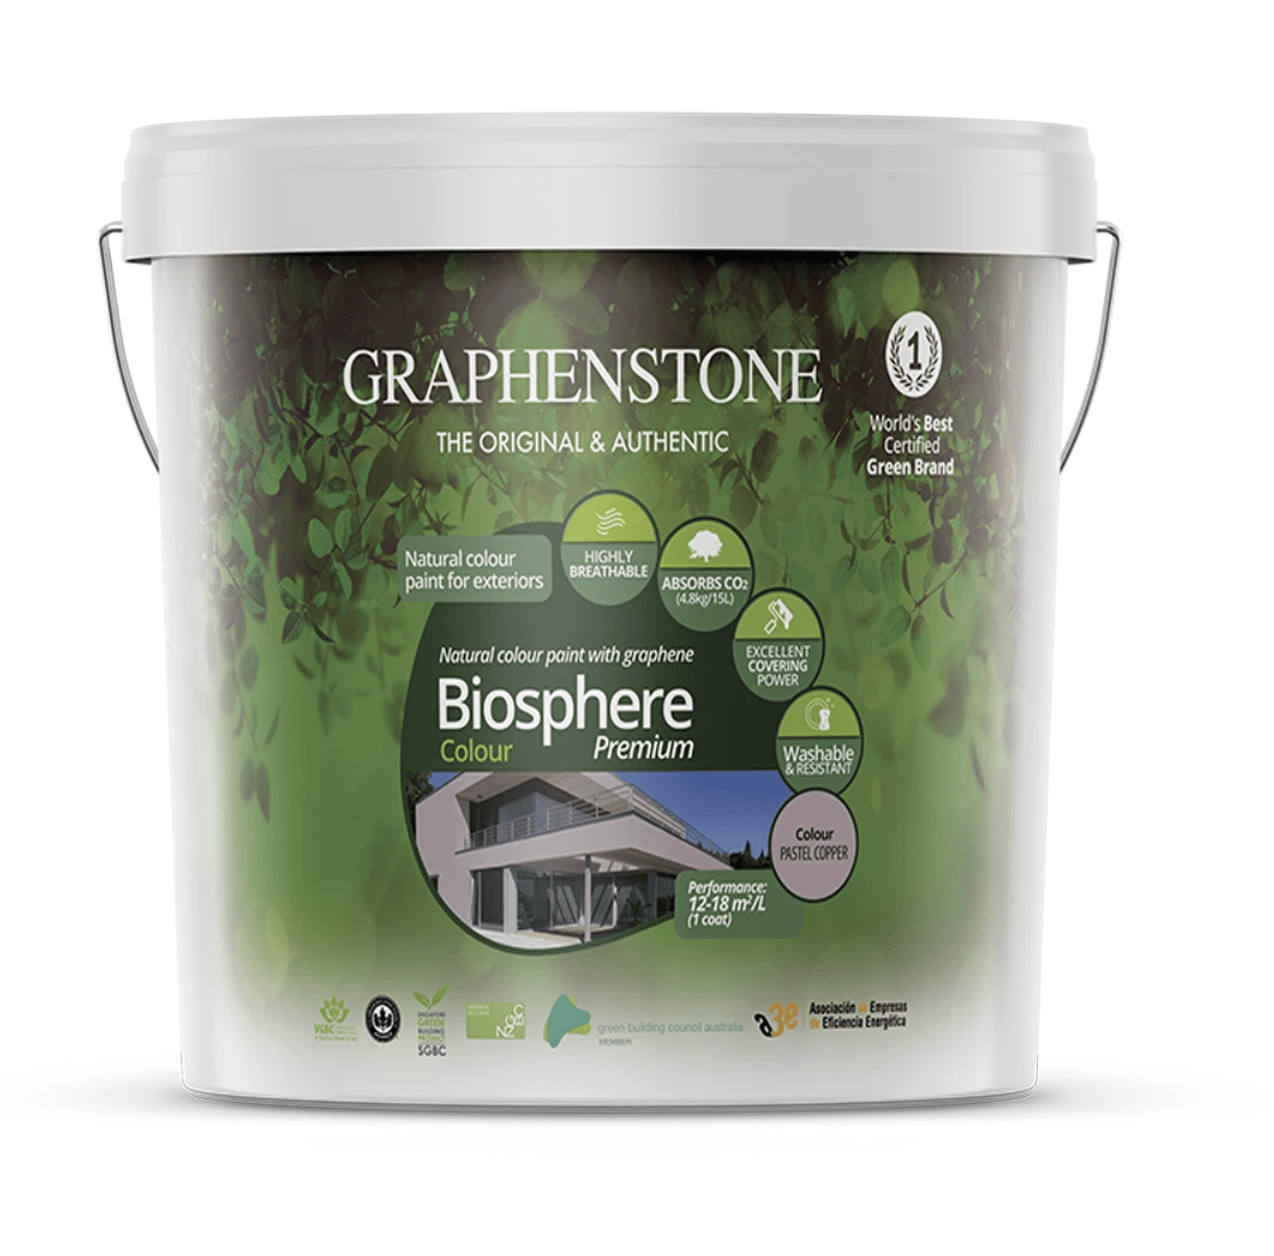 Graphenstone Biosphere Exterior Natural Paint